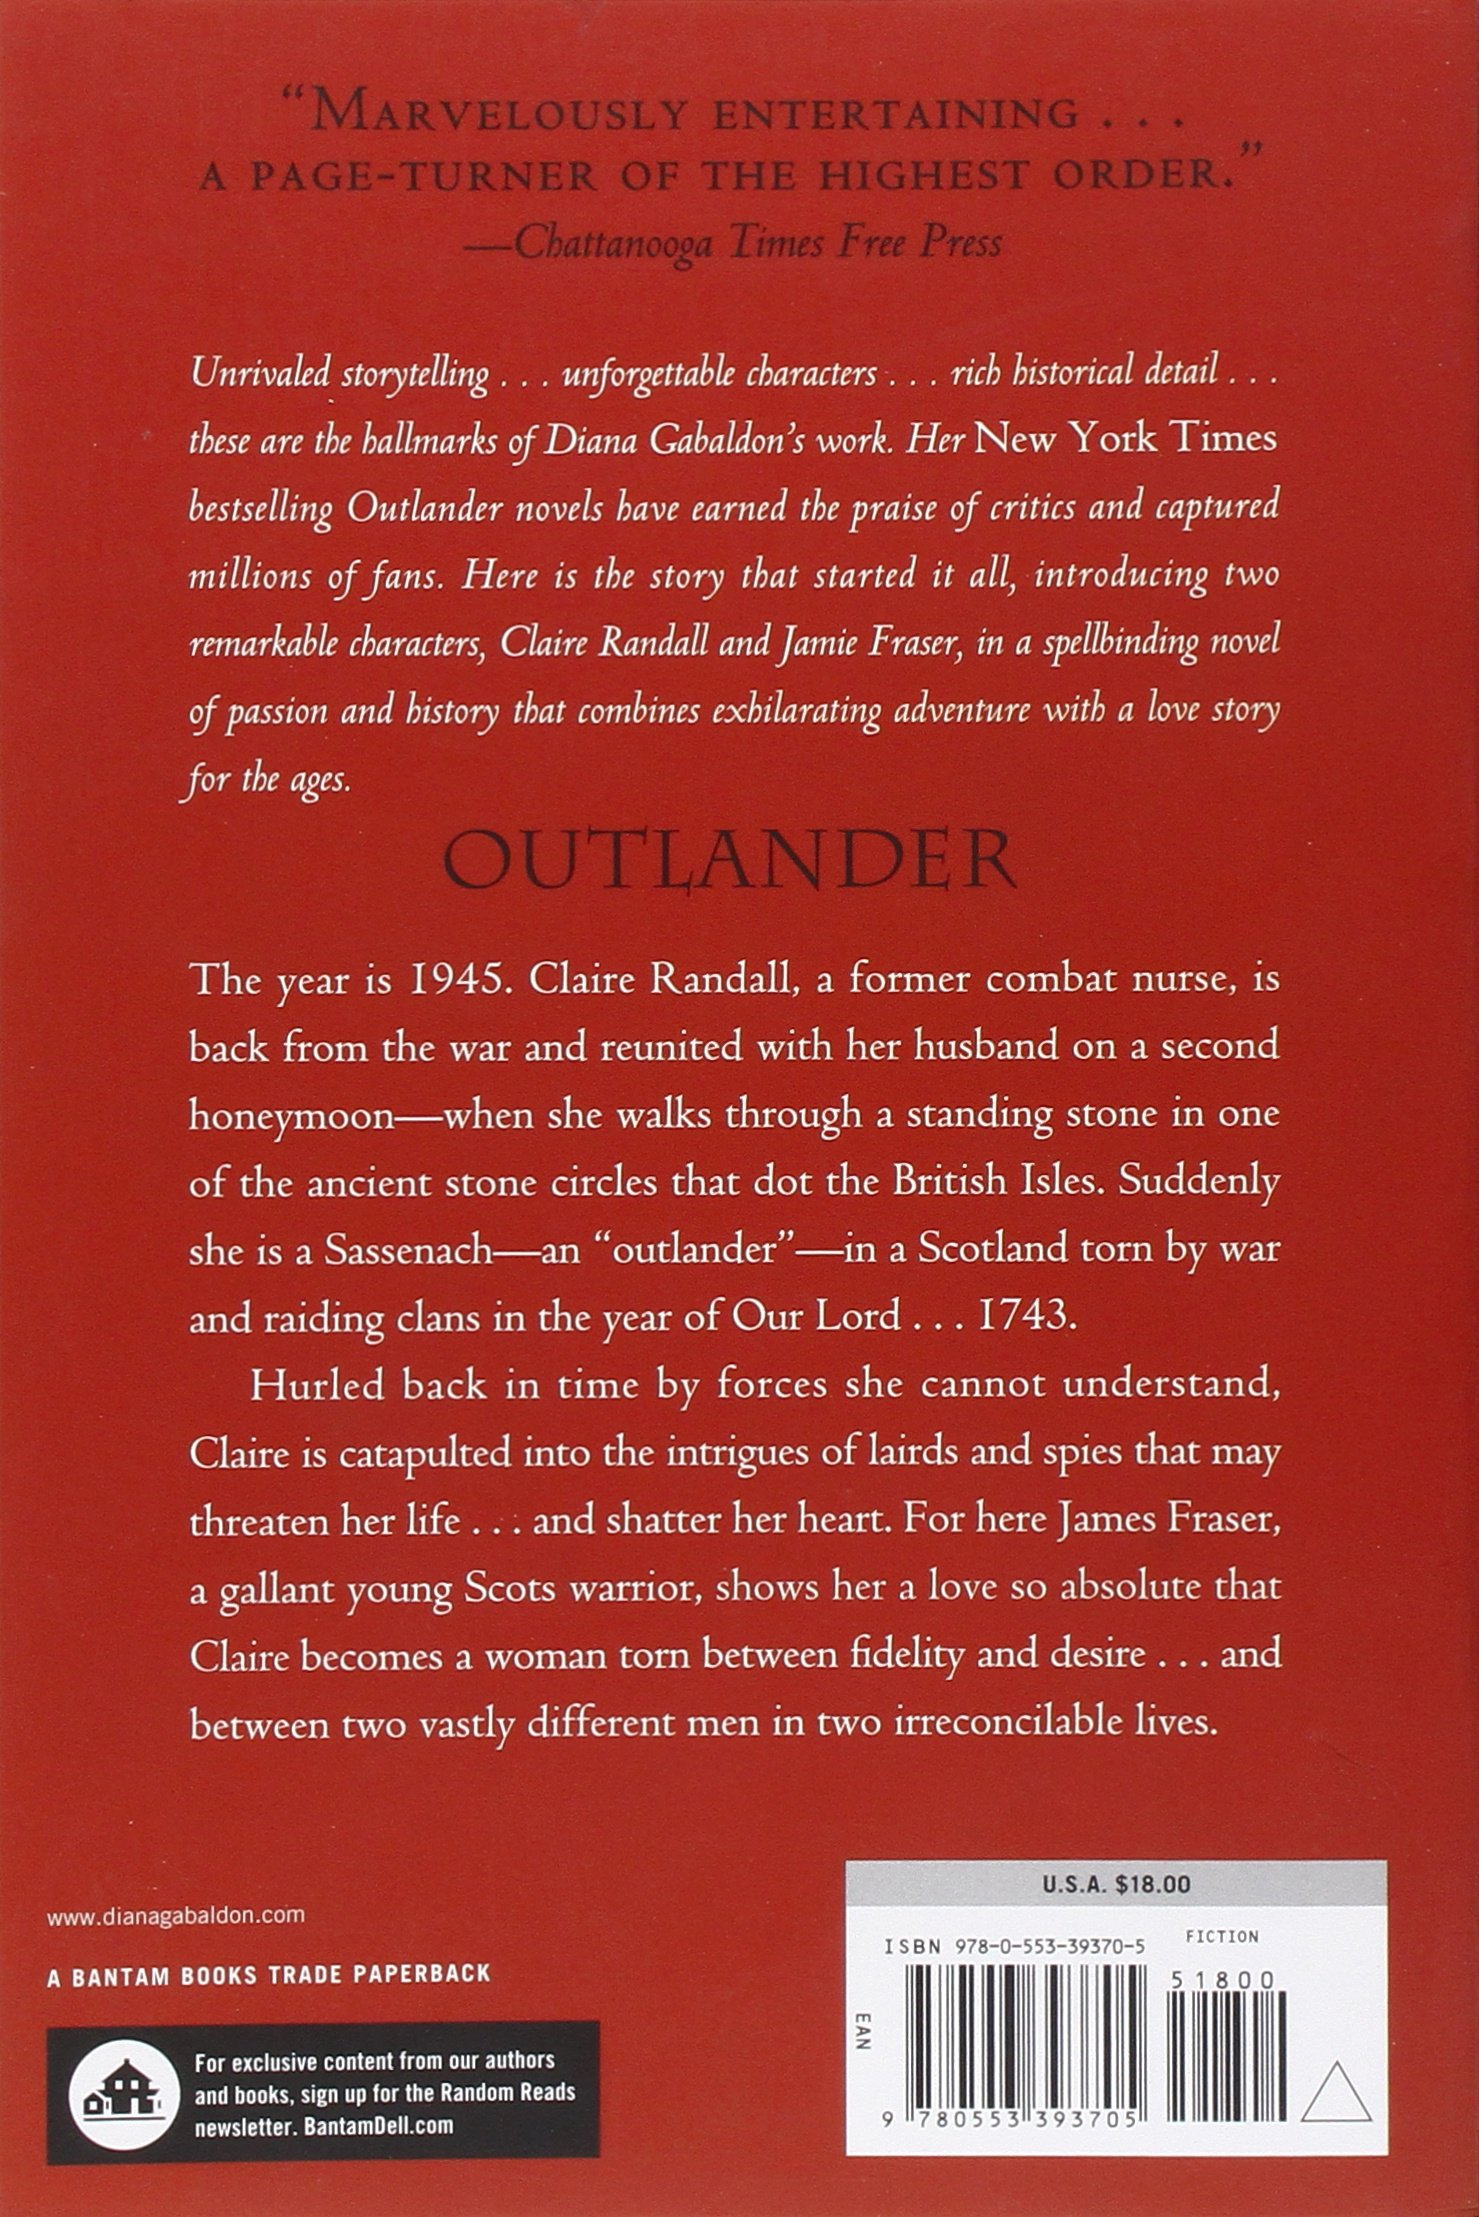 Outlander starz tie in edition a novel diana gabaldon outlander starz tie in edition a novel diana gabaldon 9780553393705 amazon books fandeluxe Gallery